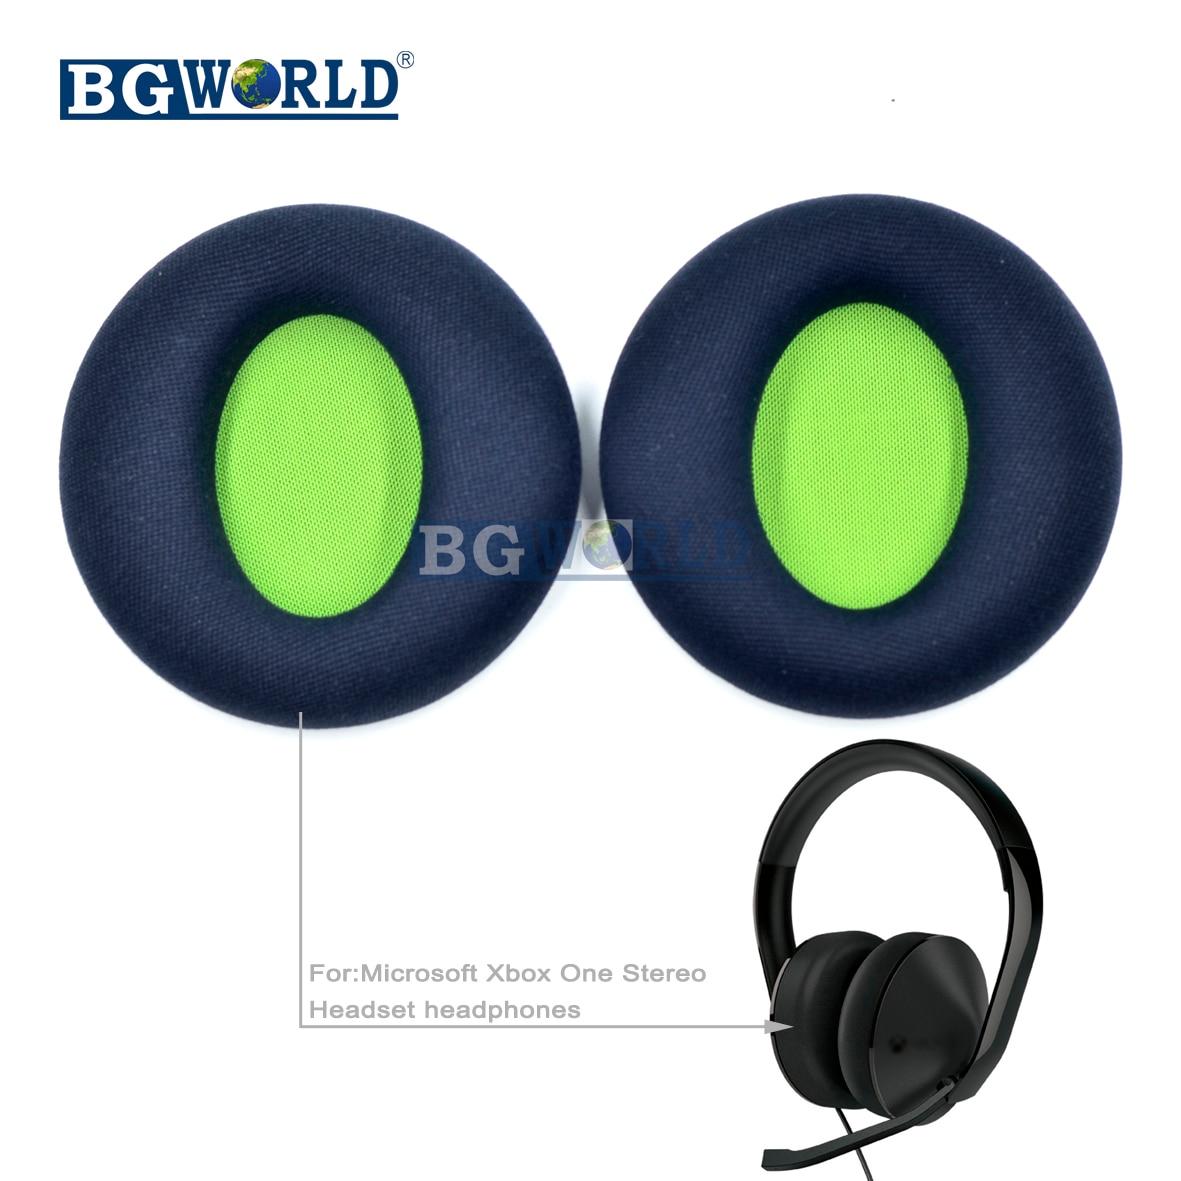 Almohadillas de espuma BGWORLD Repacement para auriculares, almohadillas de espuma para Microsoft Xbox One, auriculares estéreo, auriculares